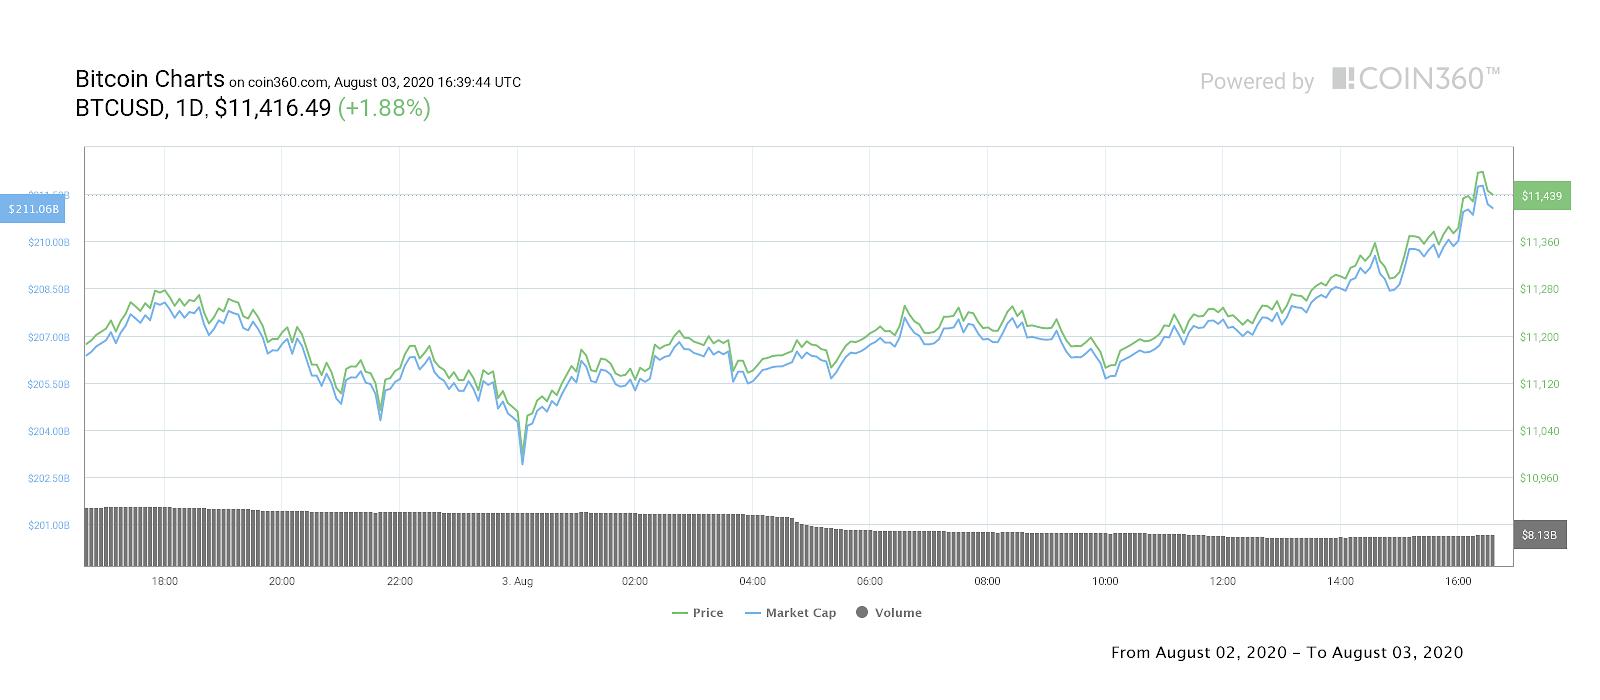 BTC/USD 1-day price chart